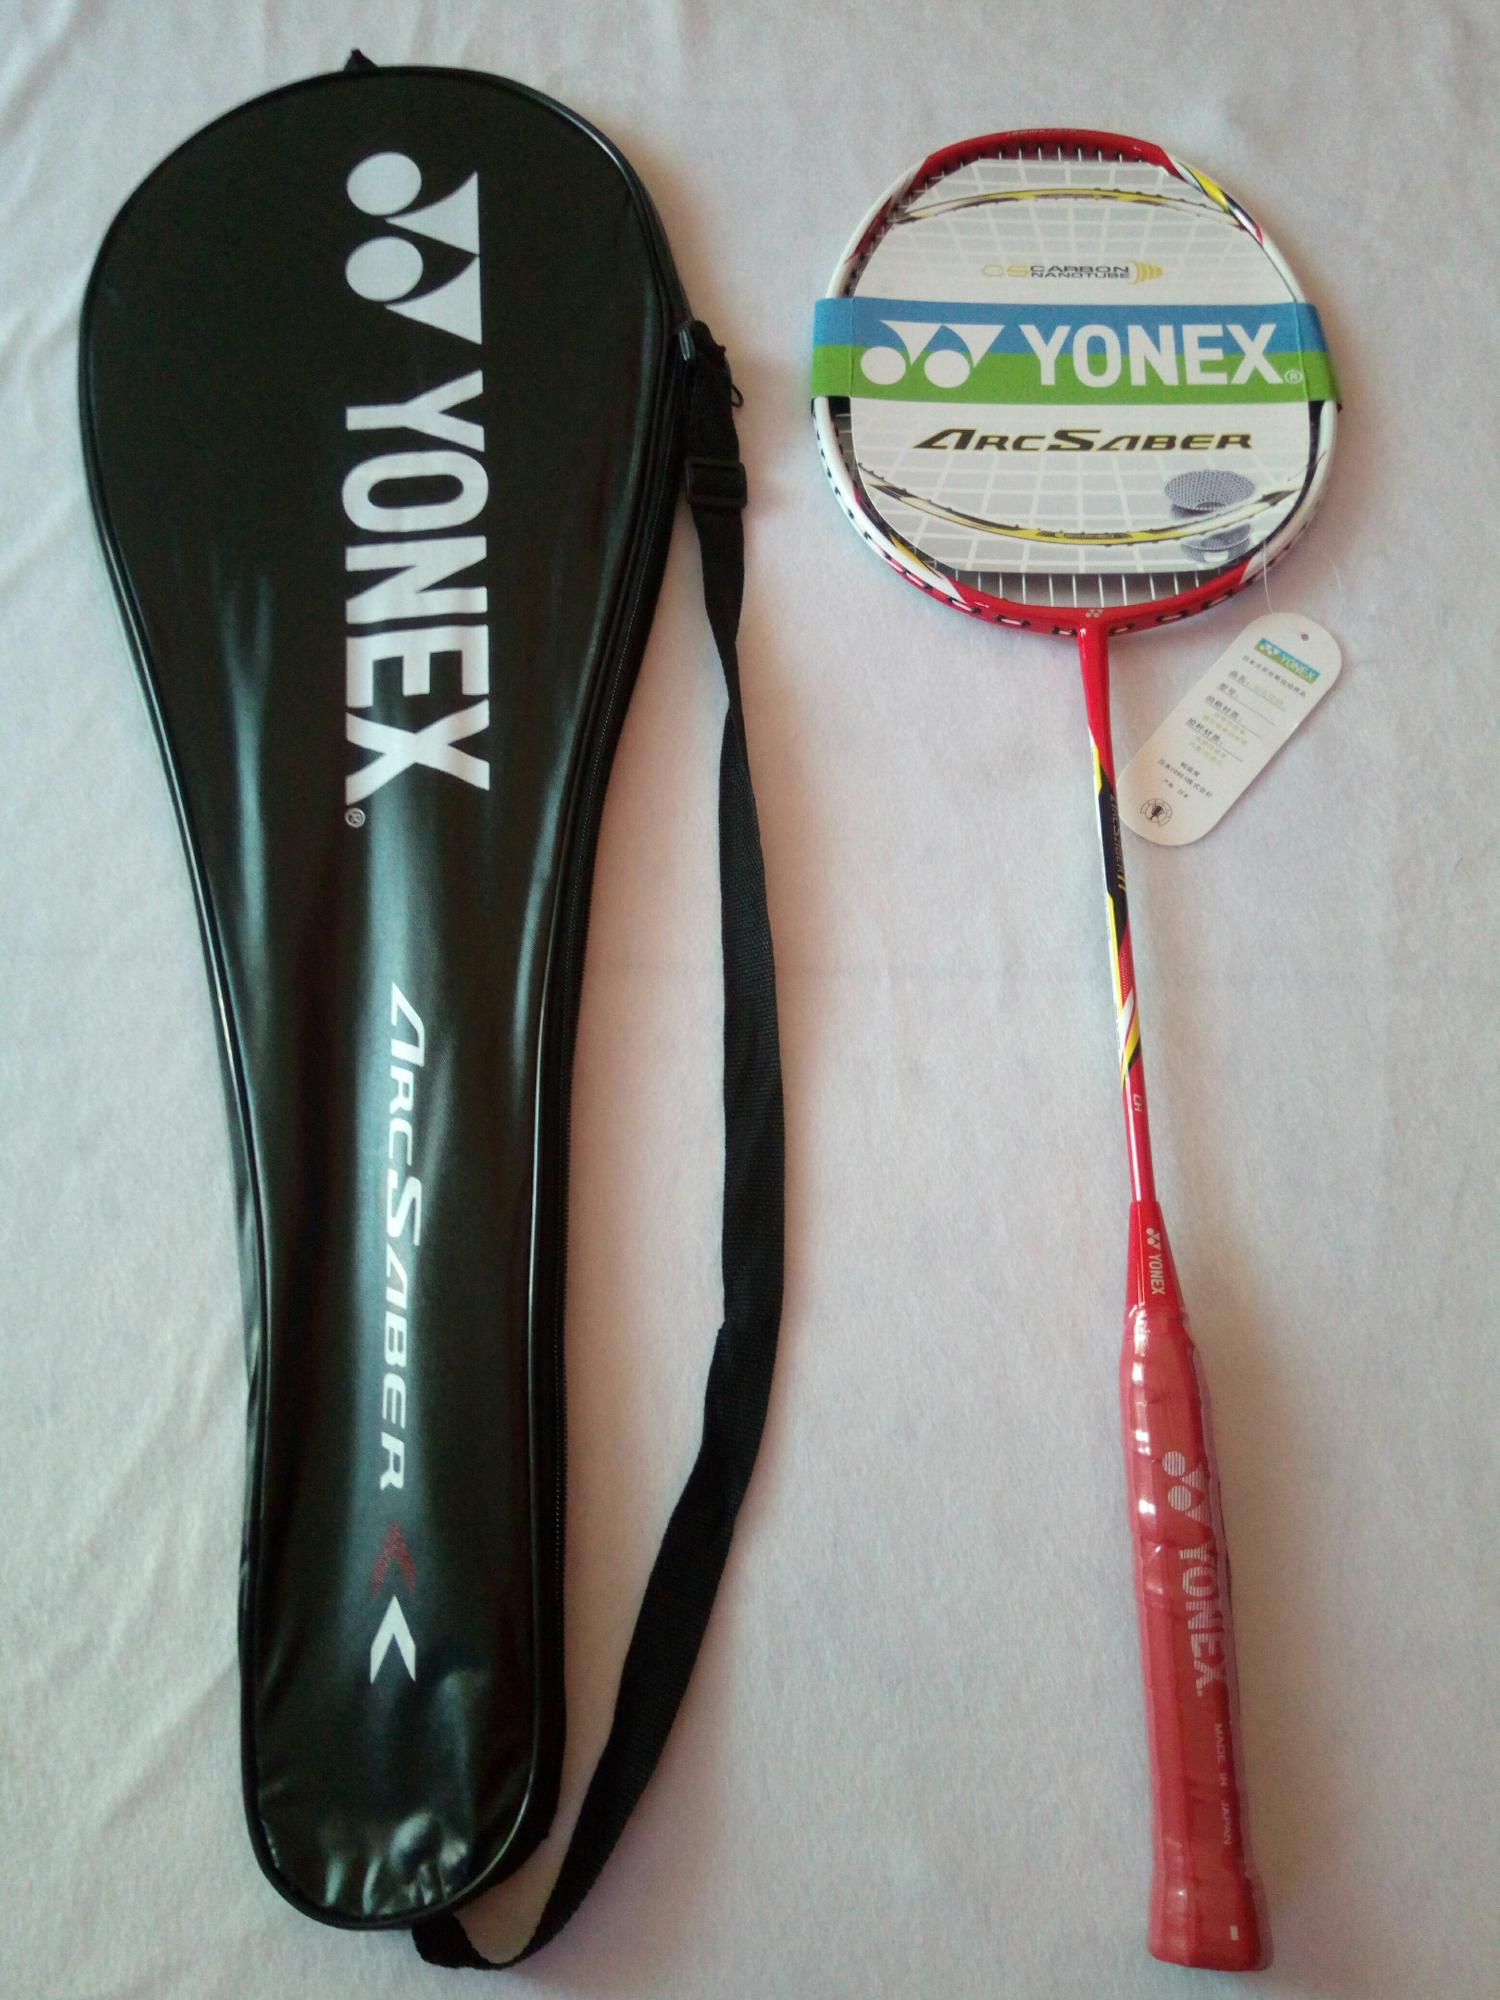 Cek Harga Baru Raket Badminton Yonex Arcsaber 6 Import Free Tas Dan Grade Super 11import